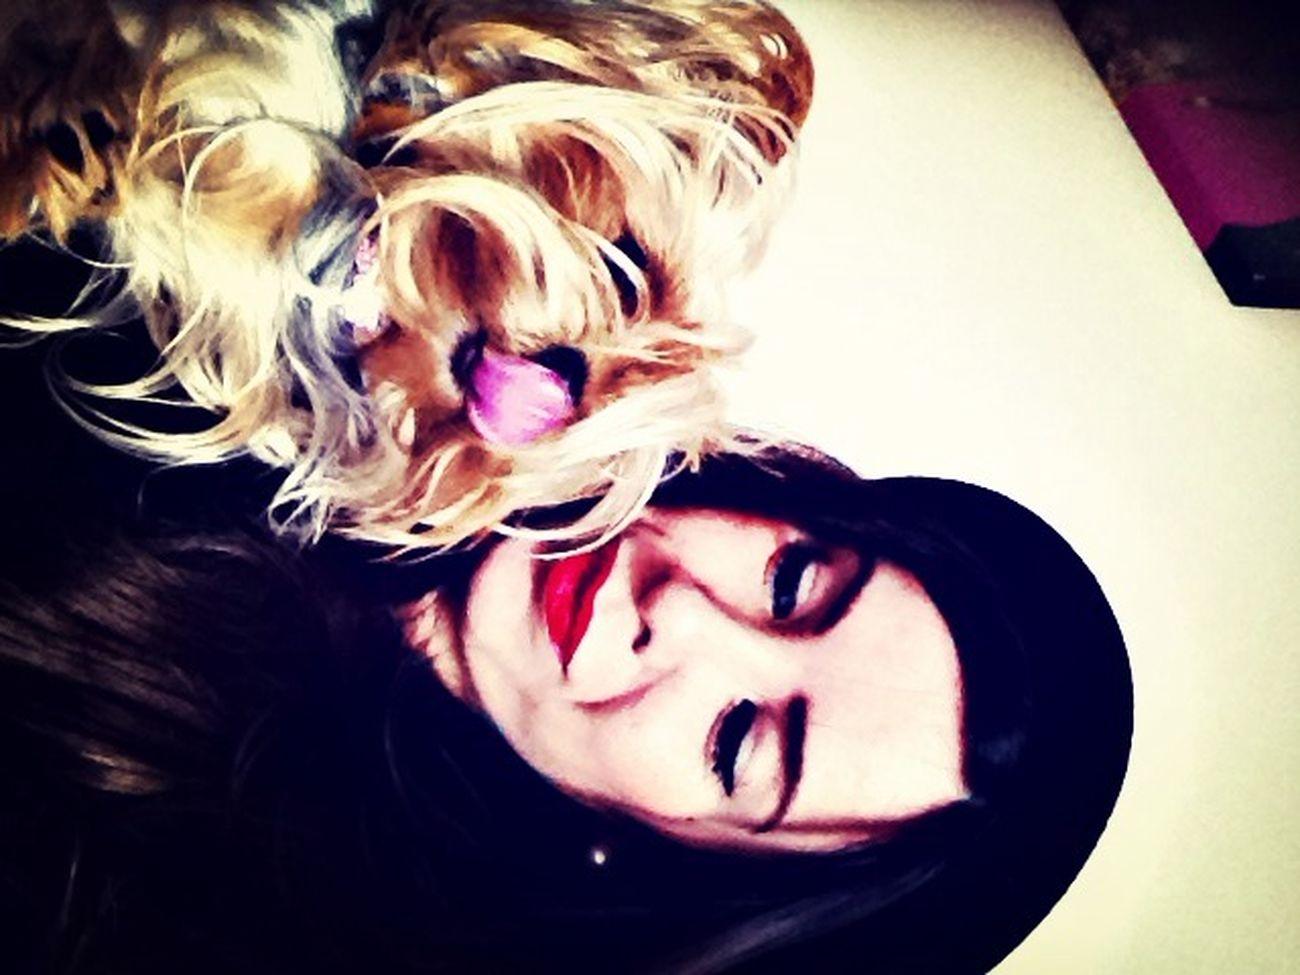 Love my pet...